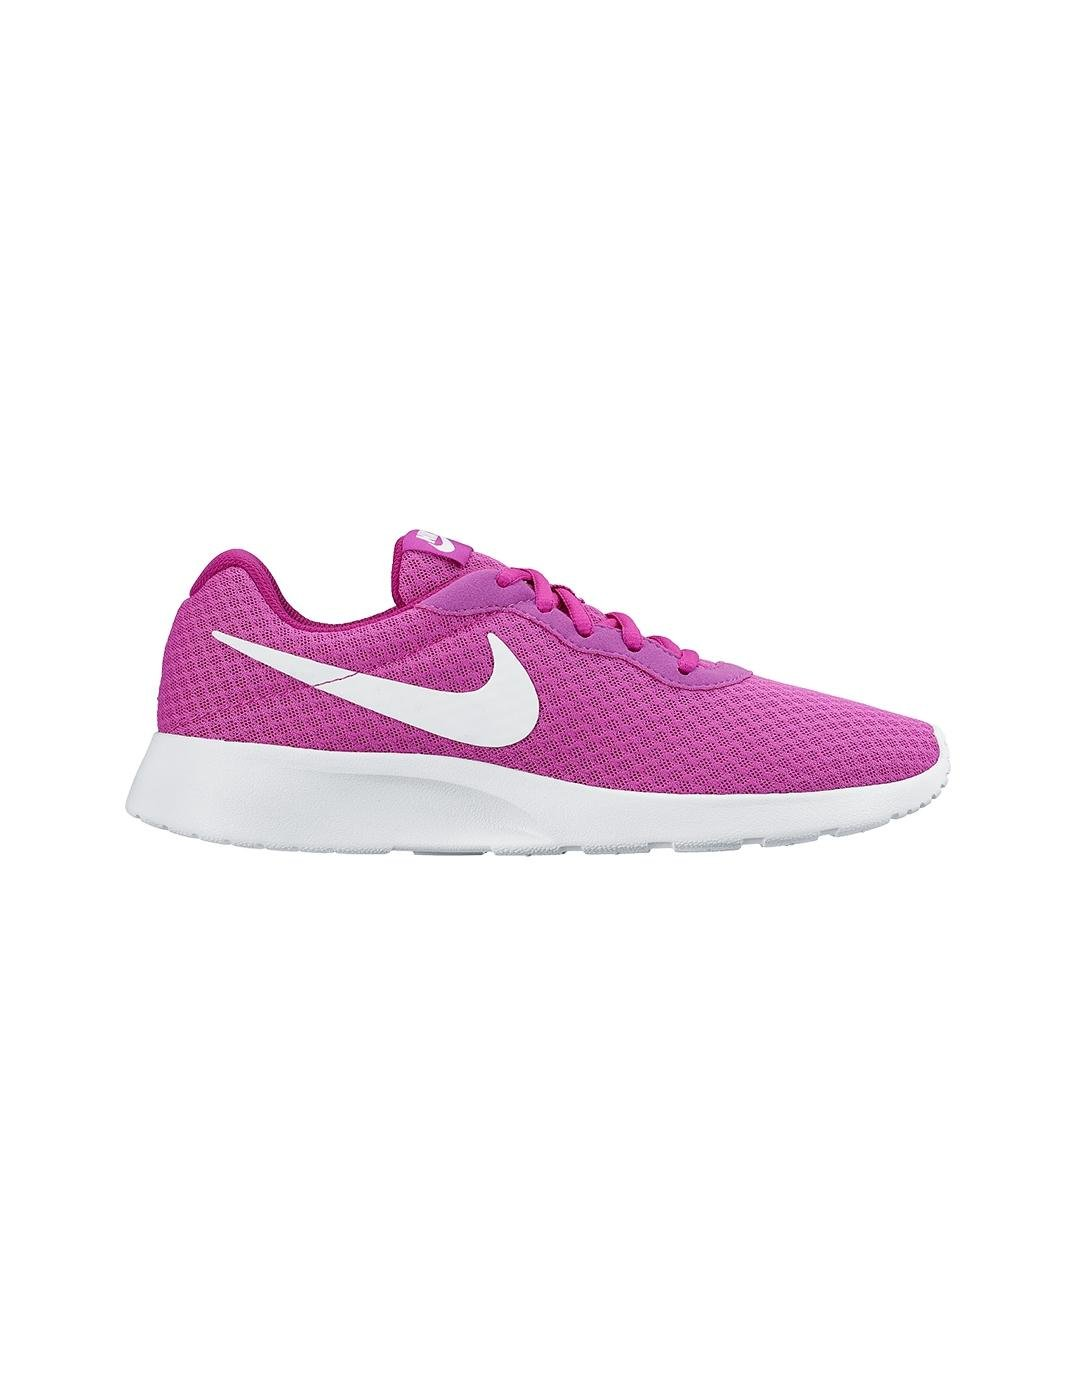 Nike Tanjun - Zapatillas para Mujer, Color Negro/Blanco 38.5 EU|Morado